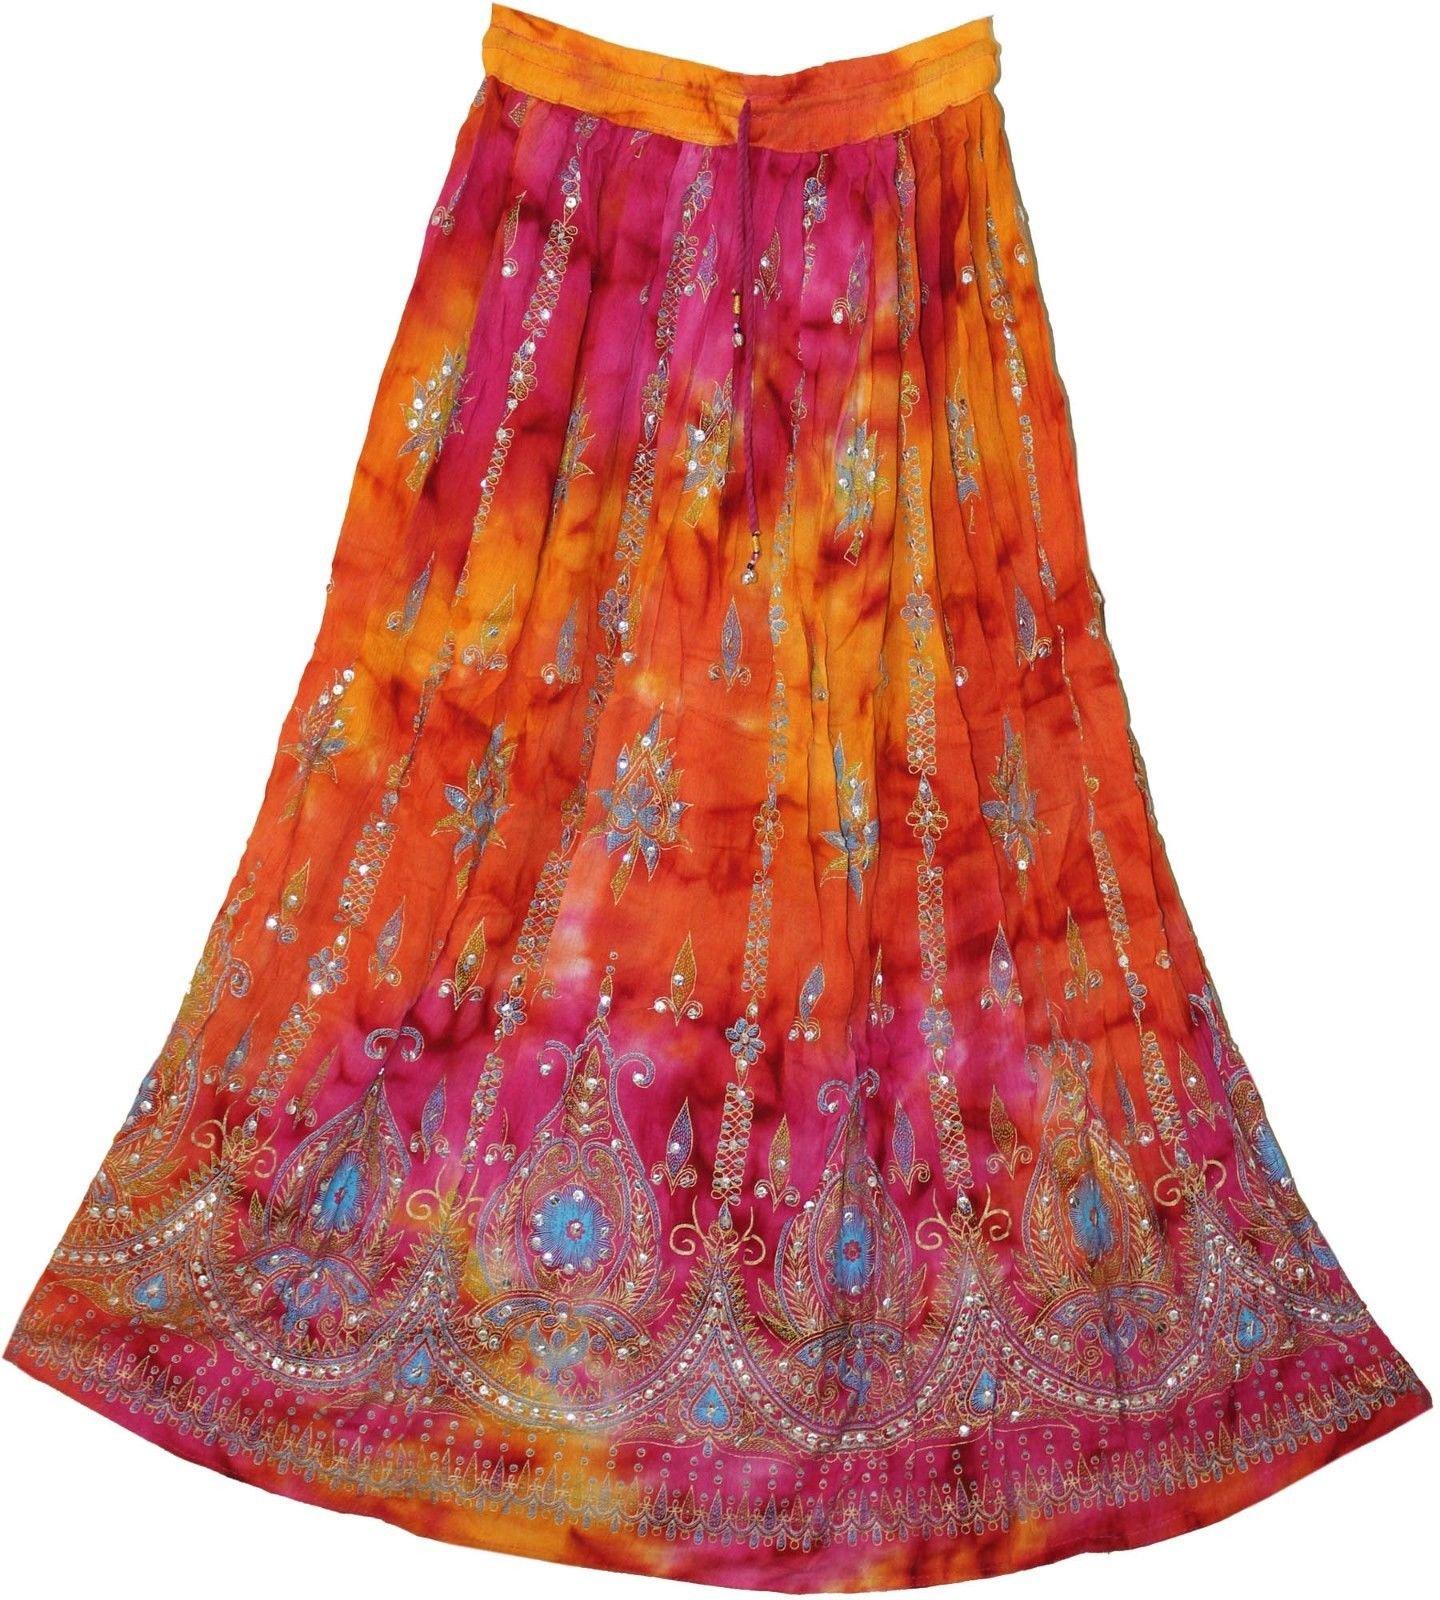 RADHY KRISHNA FASHIONS Multi tie dye Yoga Trendz Women's Sequined Crinkle Broomstick Gypsy Long Skirt